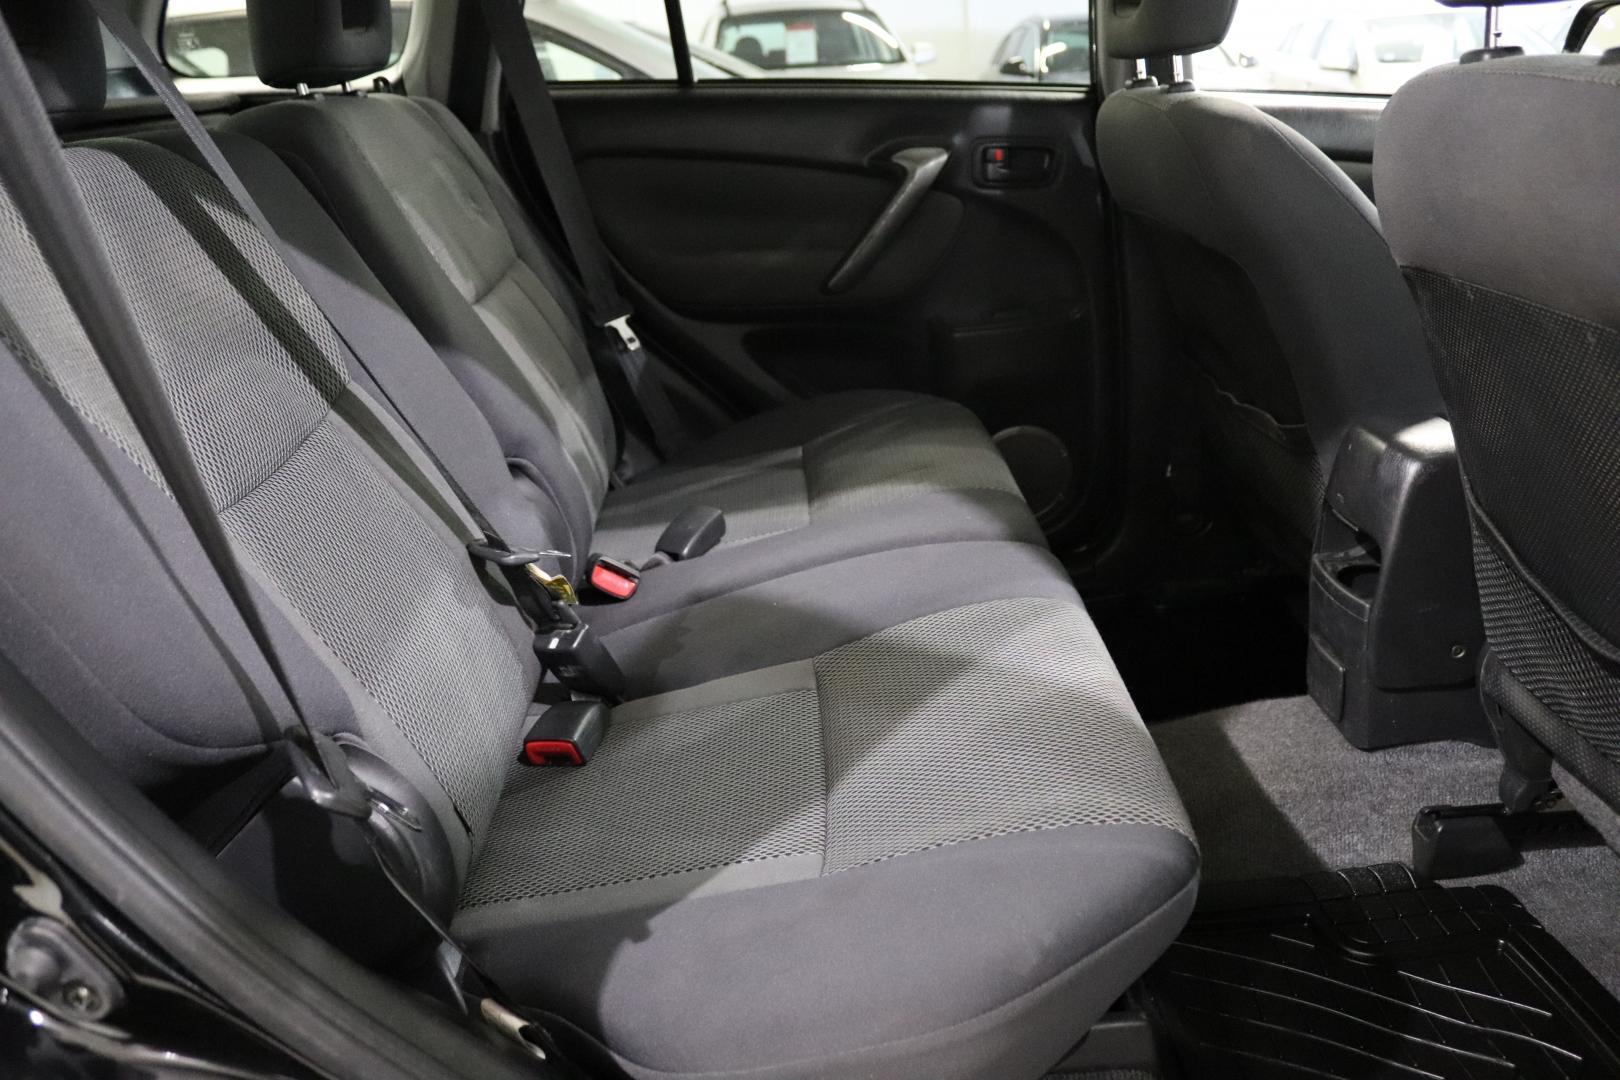 Toyota RAV4, 2.0 VVT-i 4WD 5d